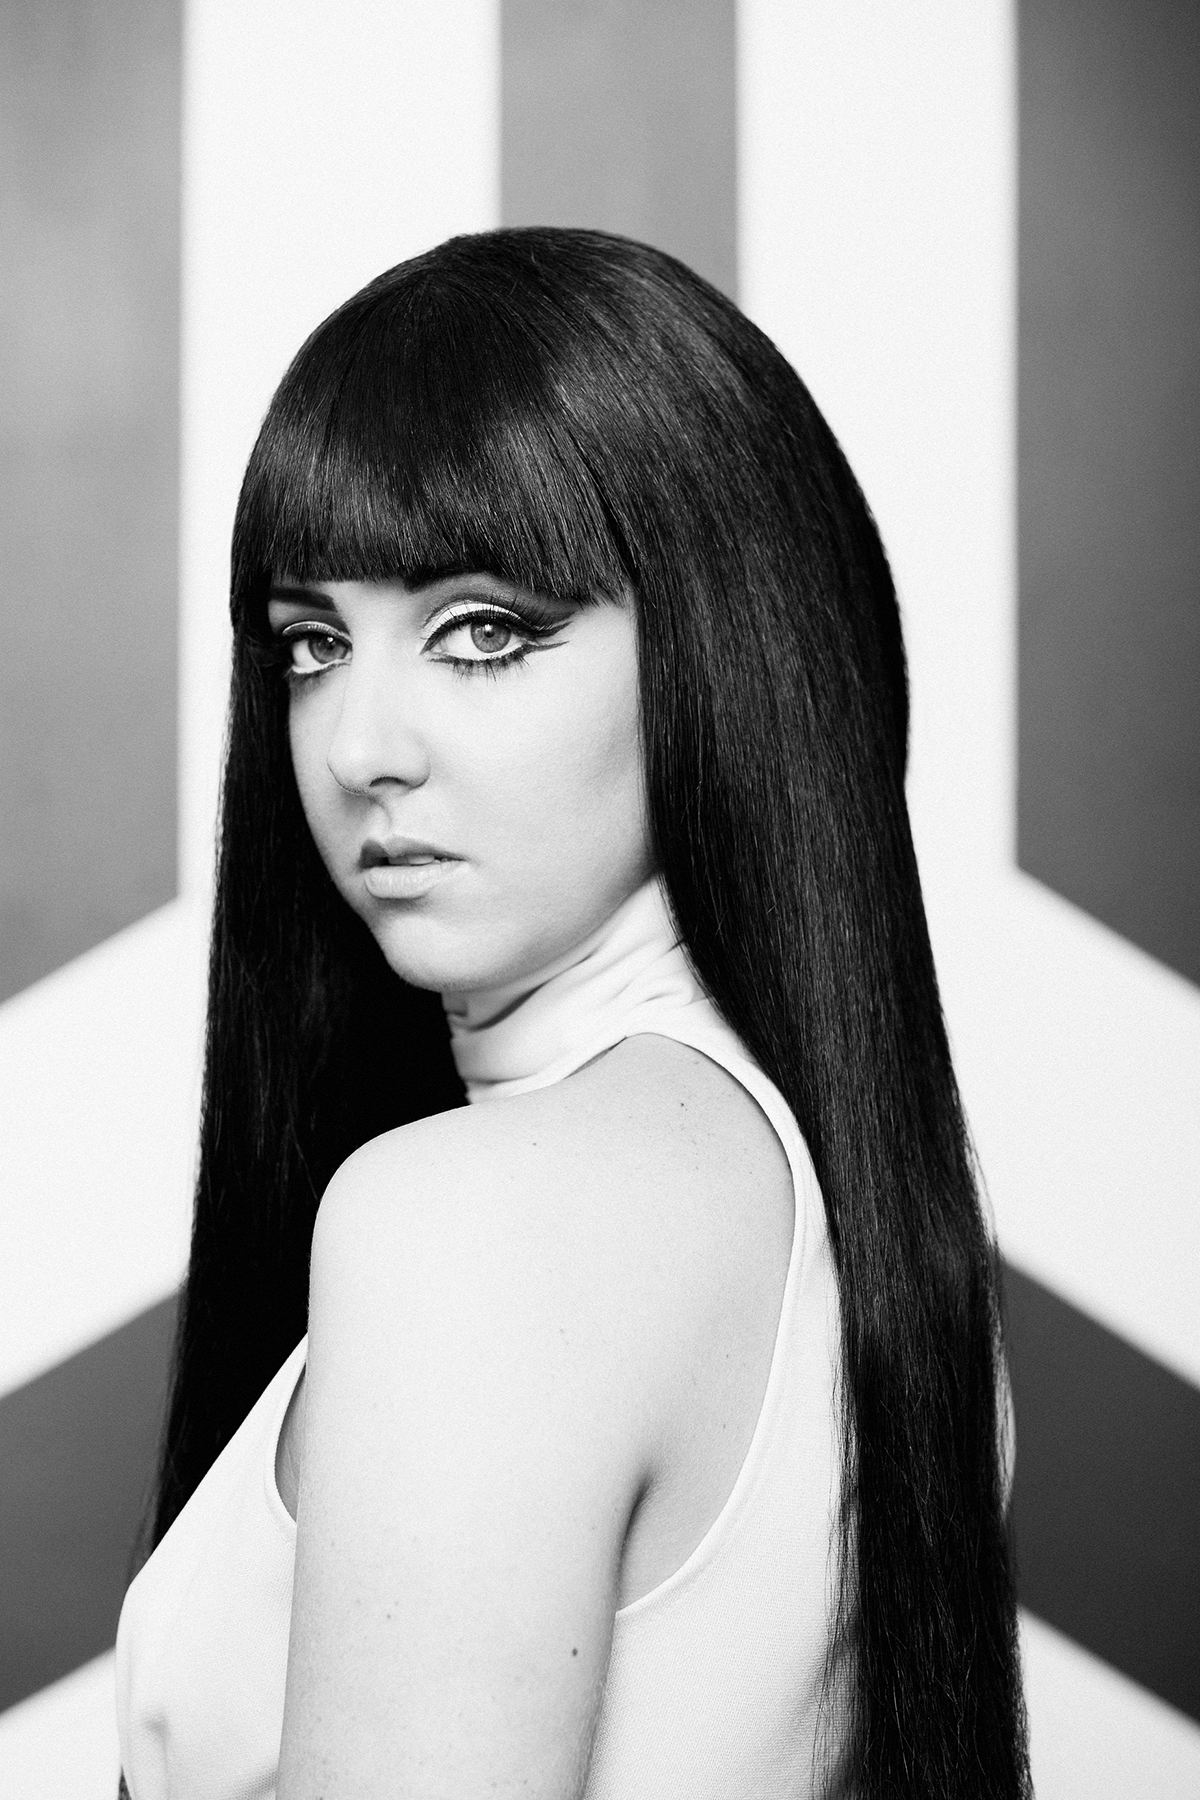 Chelsea-Wilson-Channeling Cher-2